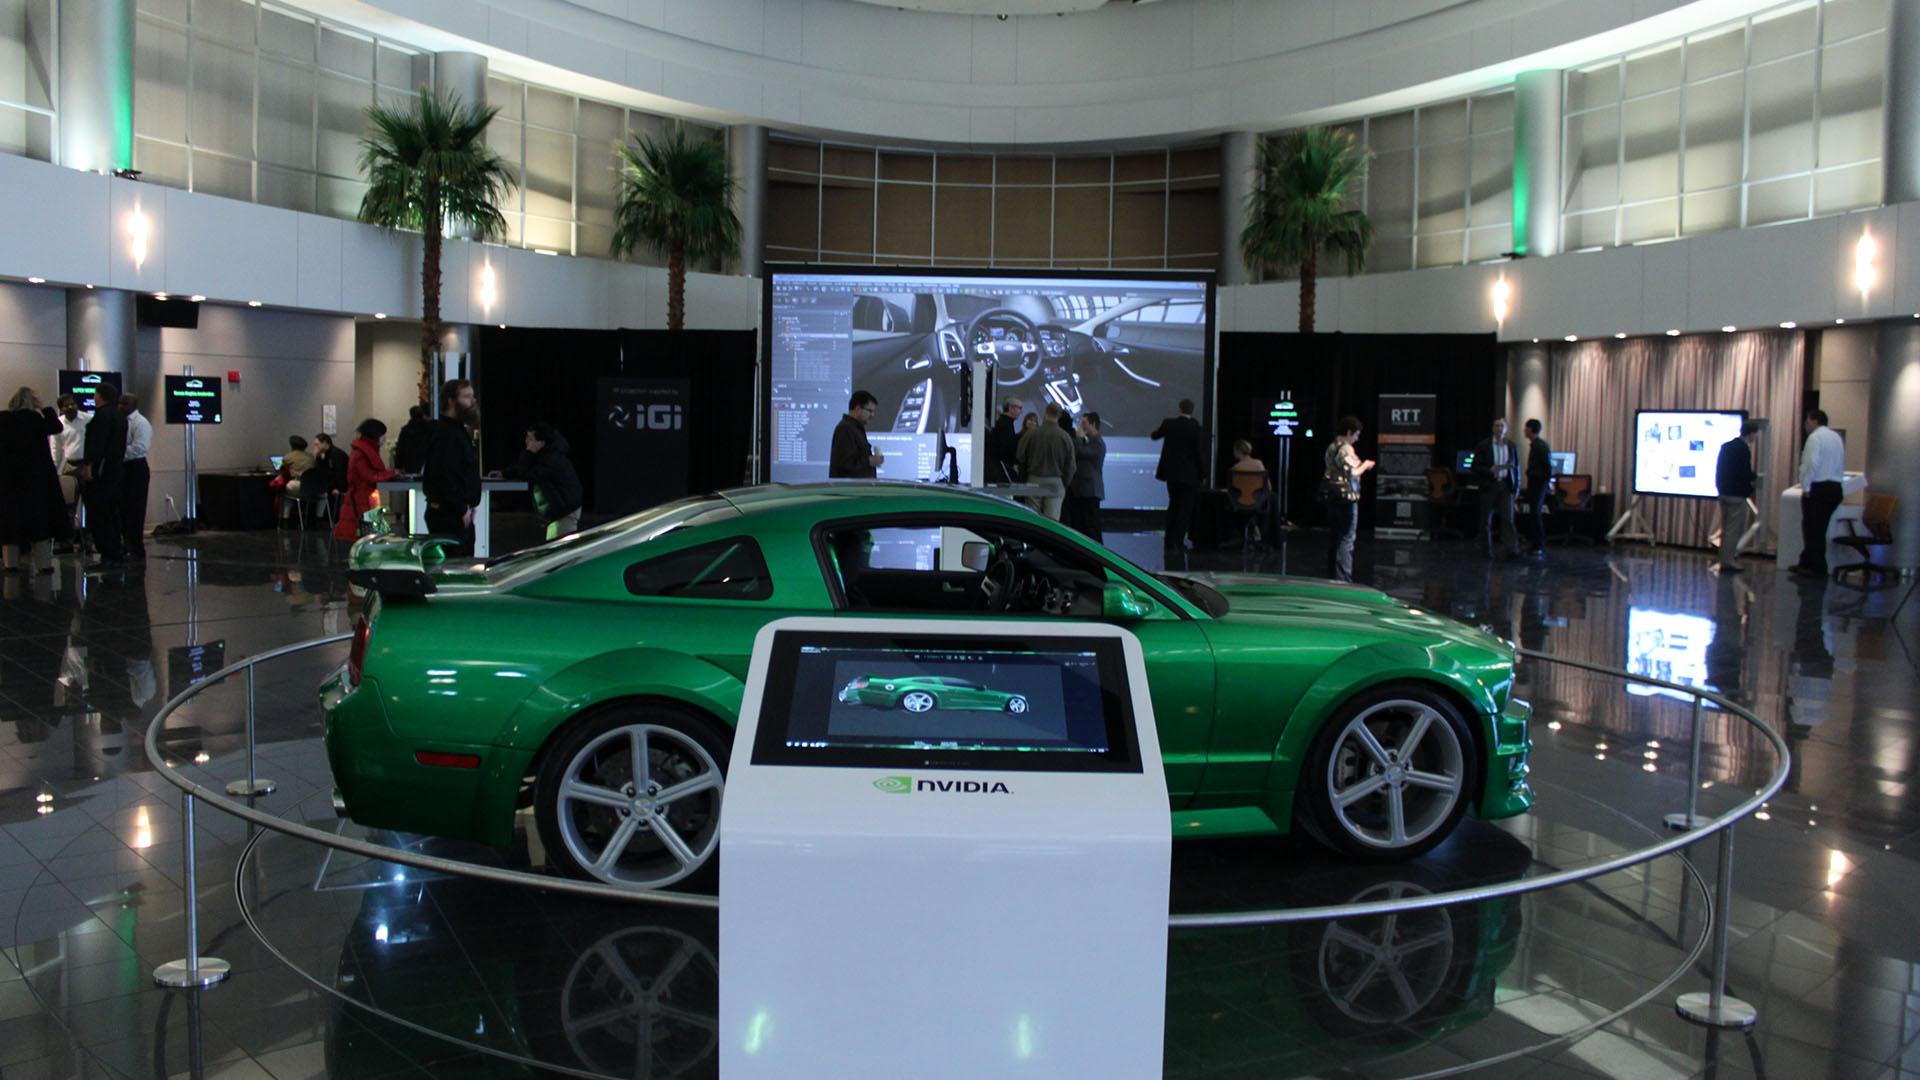 NVIDIA day at Ford IGI 23' 4K powerwall automotive